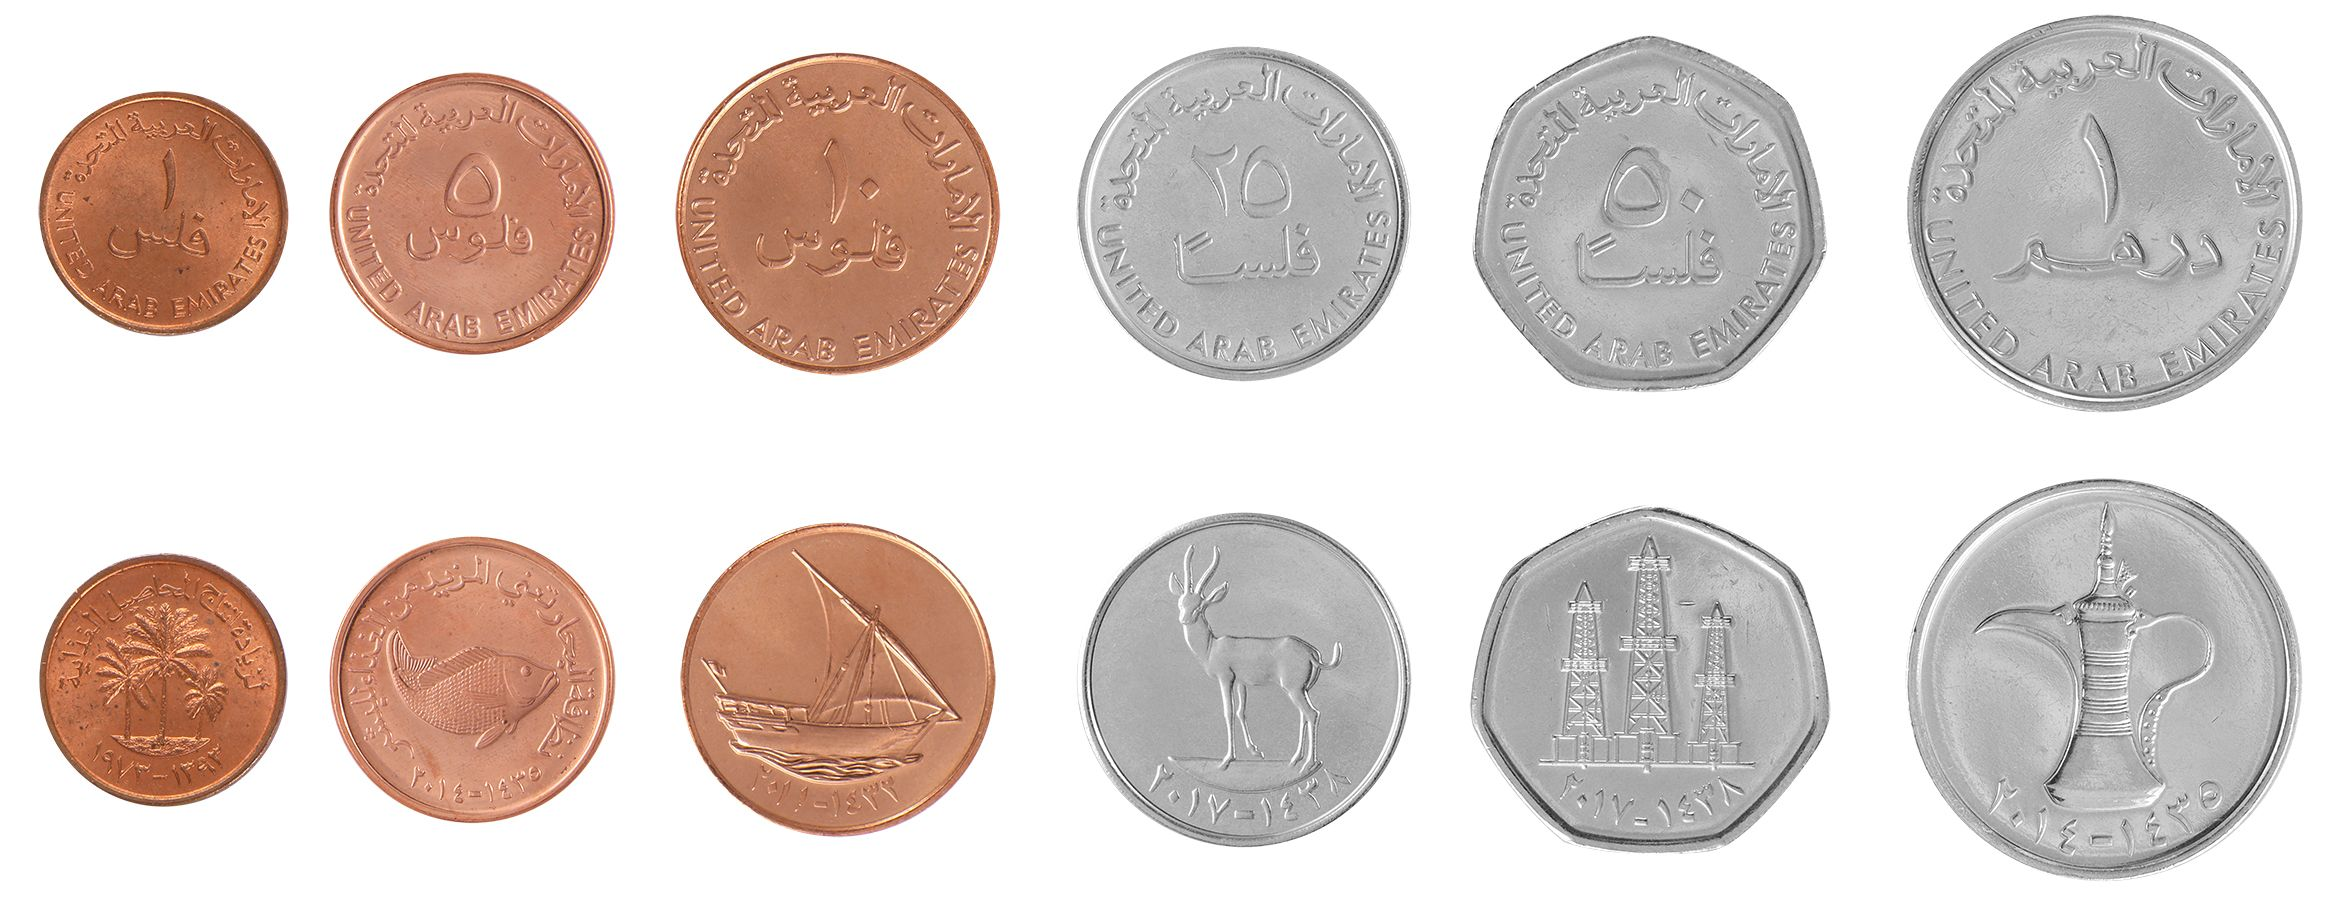 uae coins